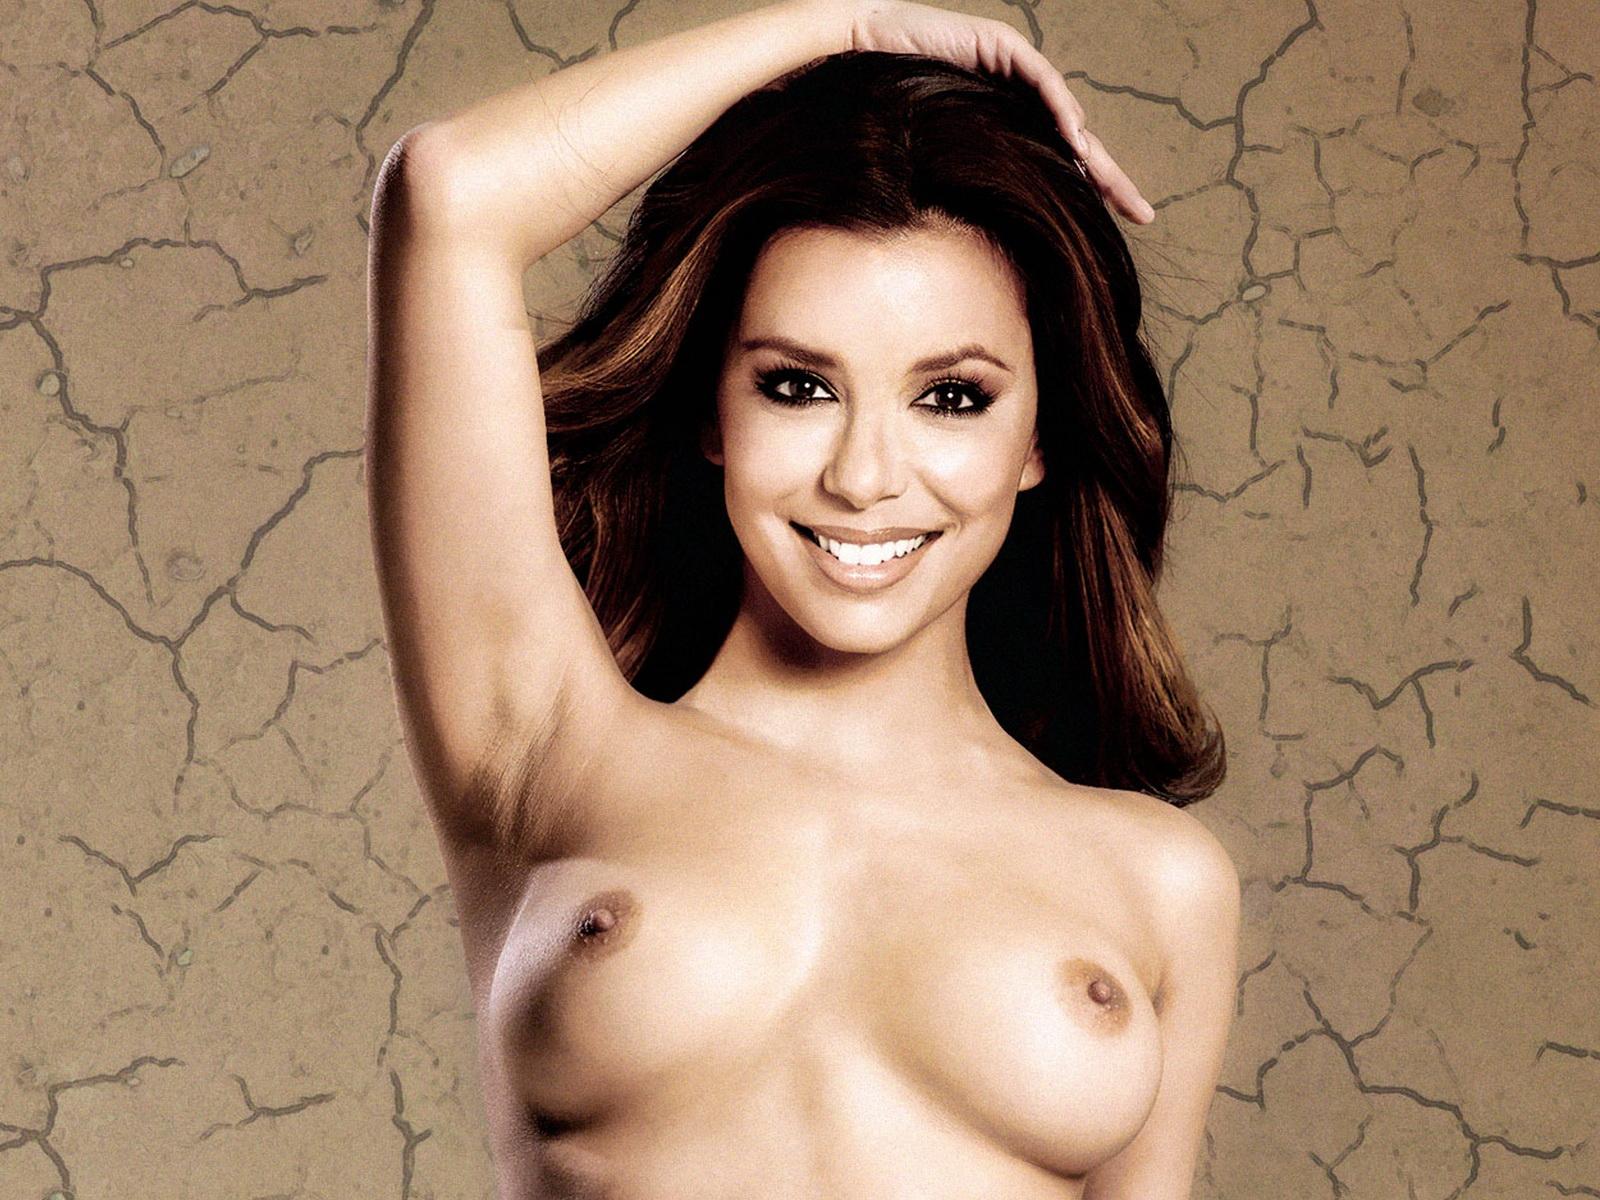 Eva longoria sexy nude